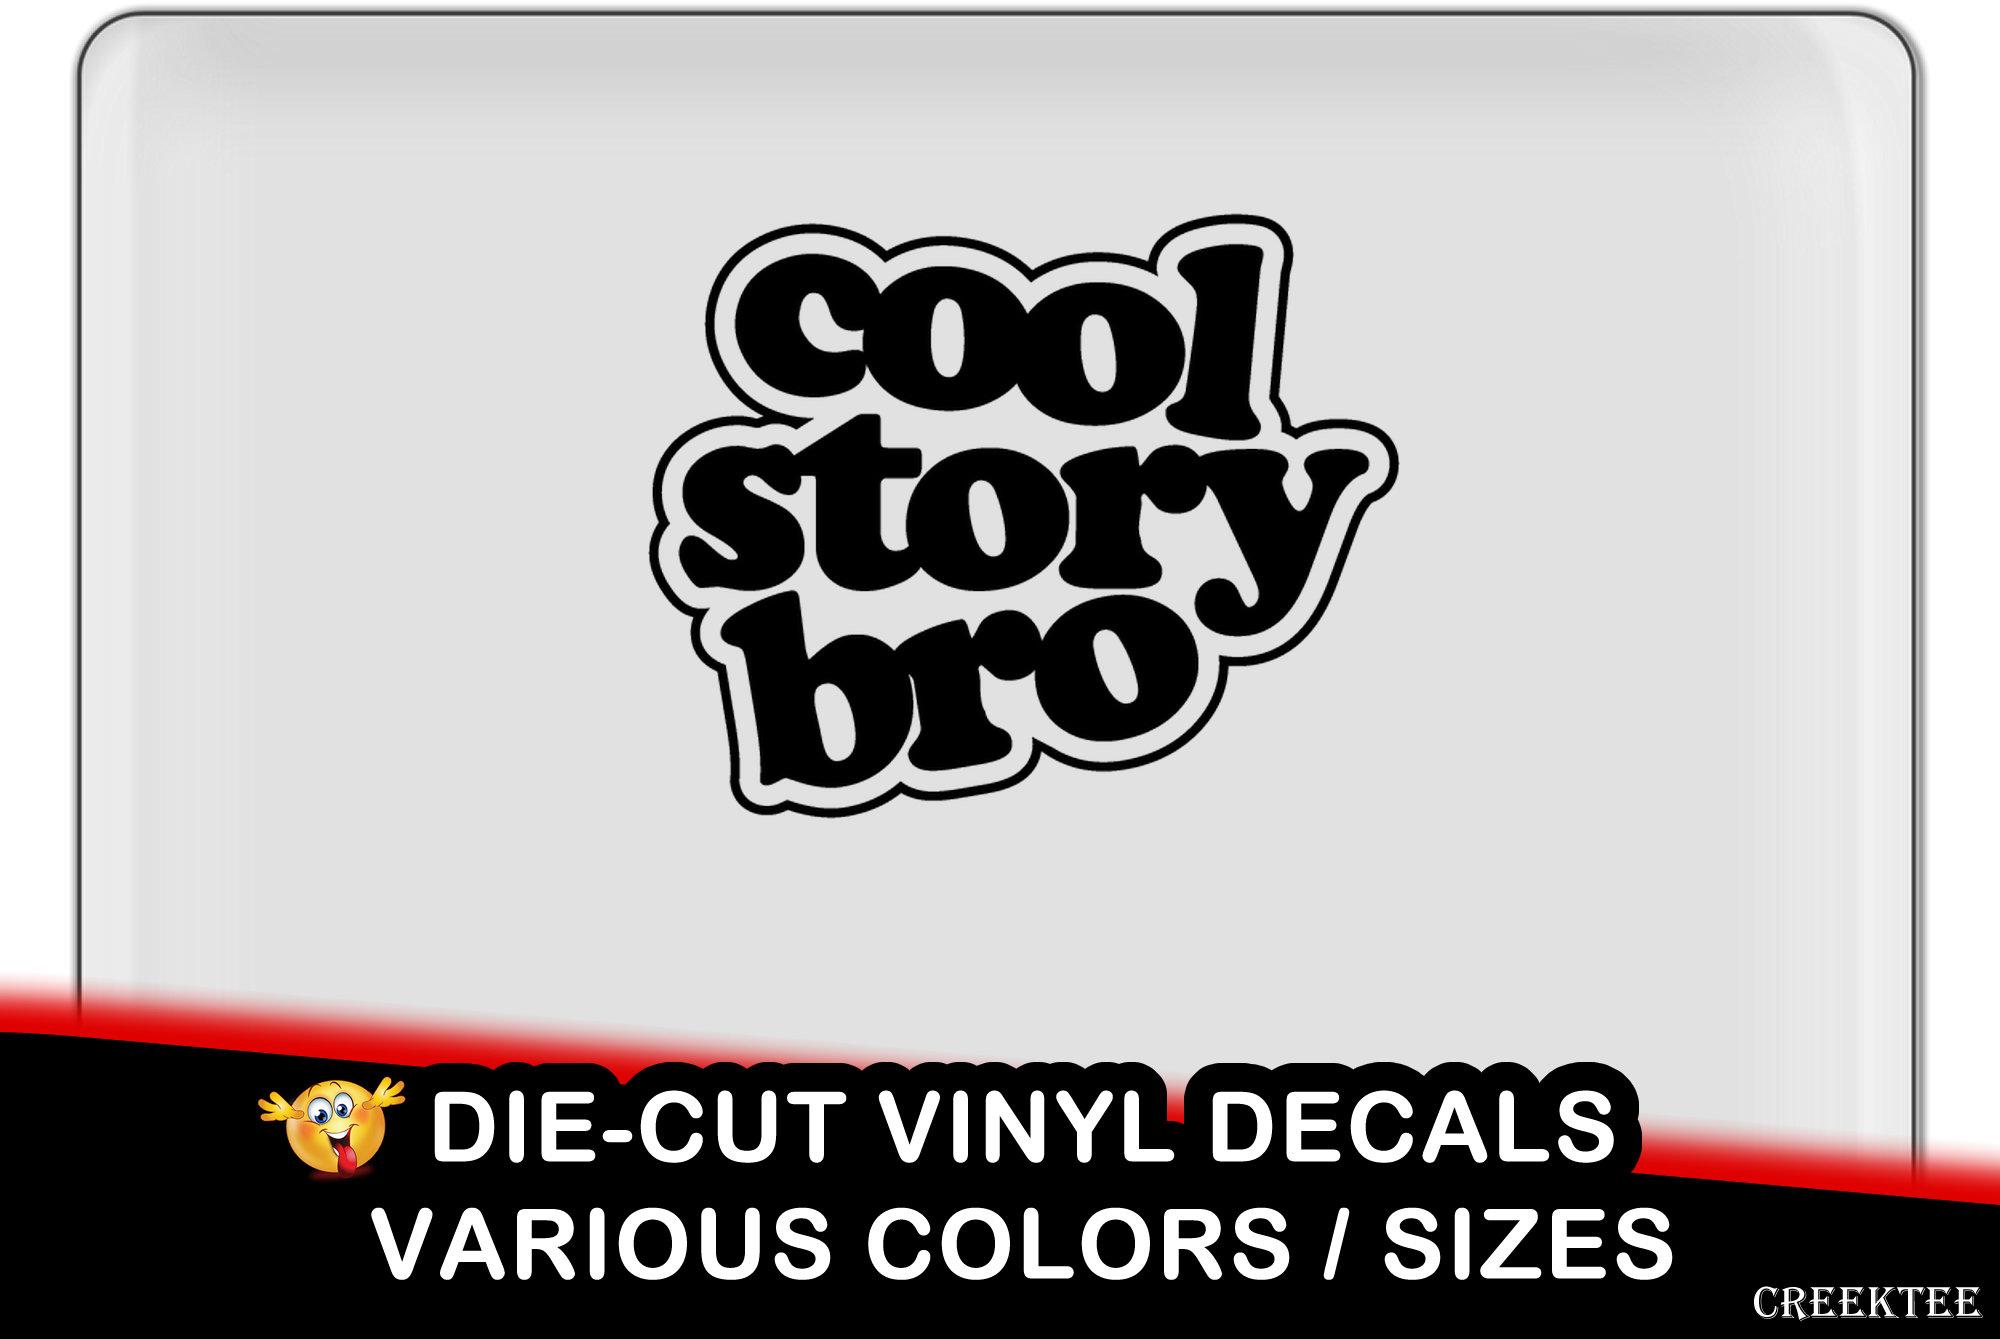 Cool Story Bro Vinyl Decal - fun vinyl decal in various colors